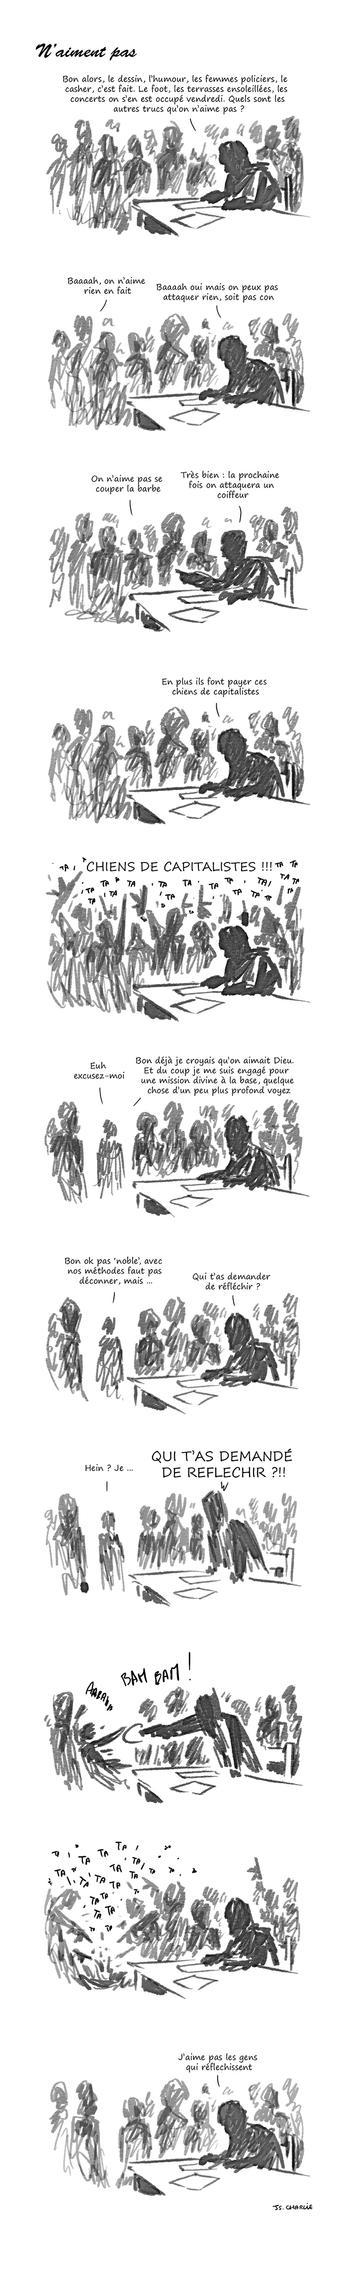 N'aiment pas by Gandalfleblond